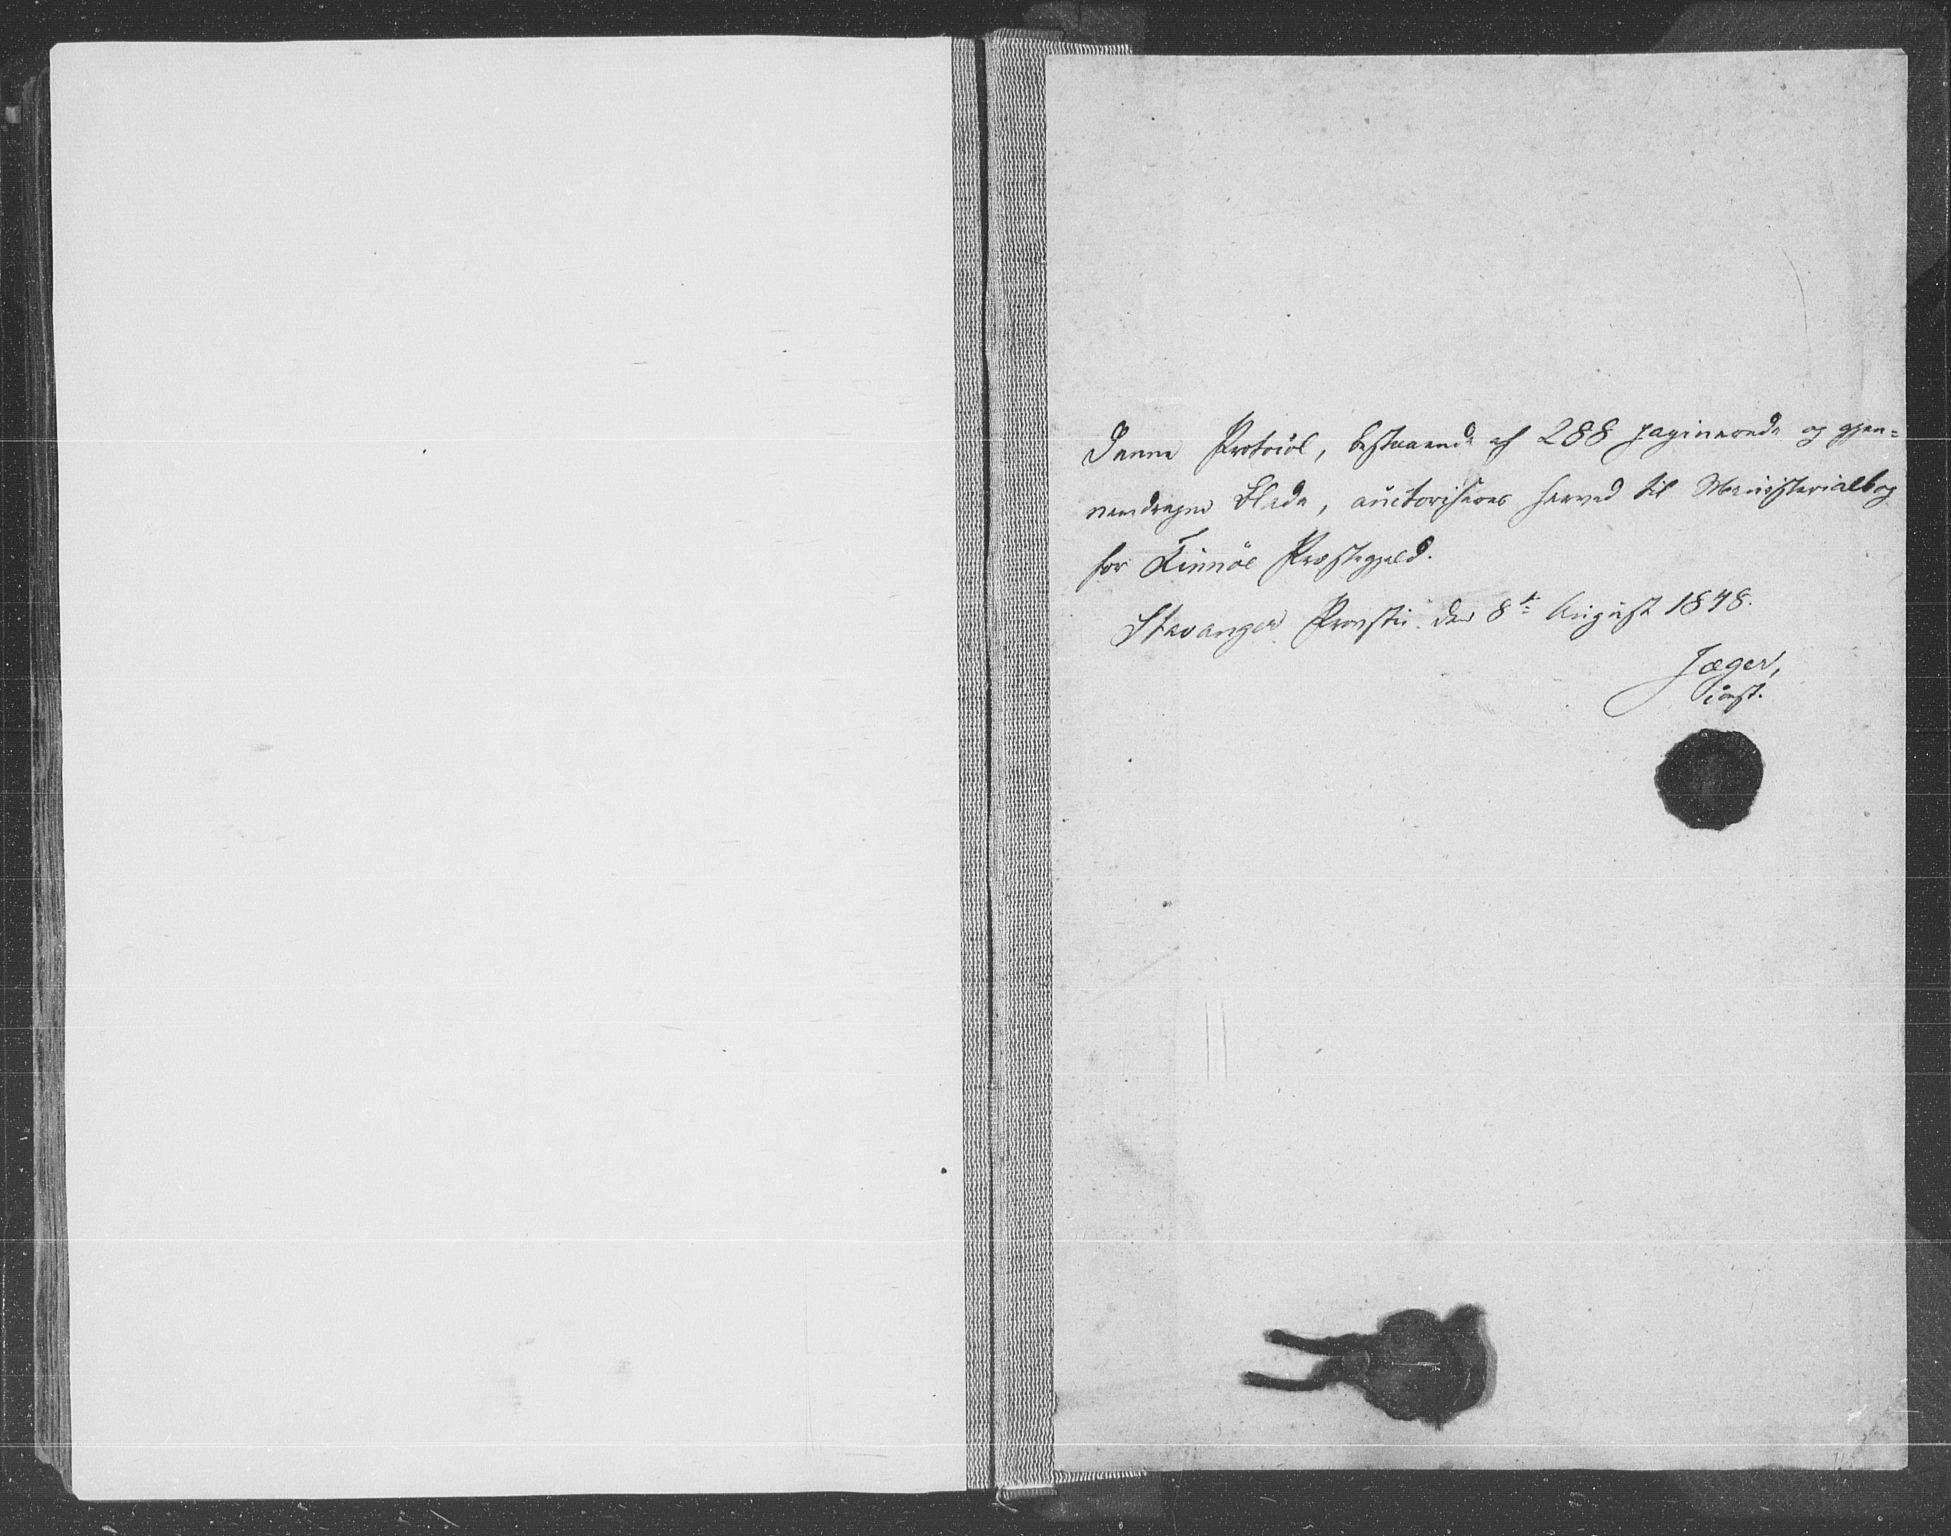 SAST, Finnøy sokneprestkontor, H/Ha/Haa/L0007: Ministerialbok nr. A 7, 1847-1862